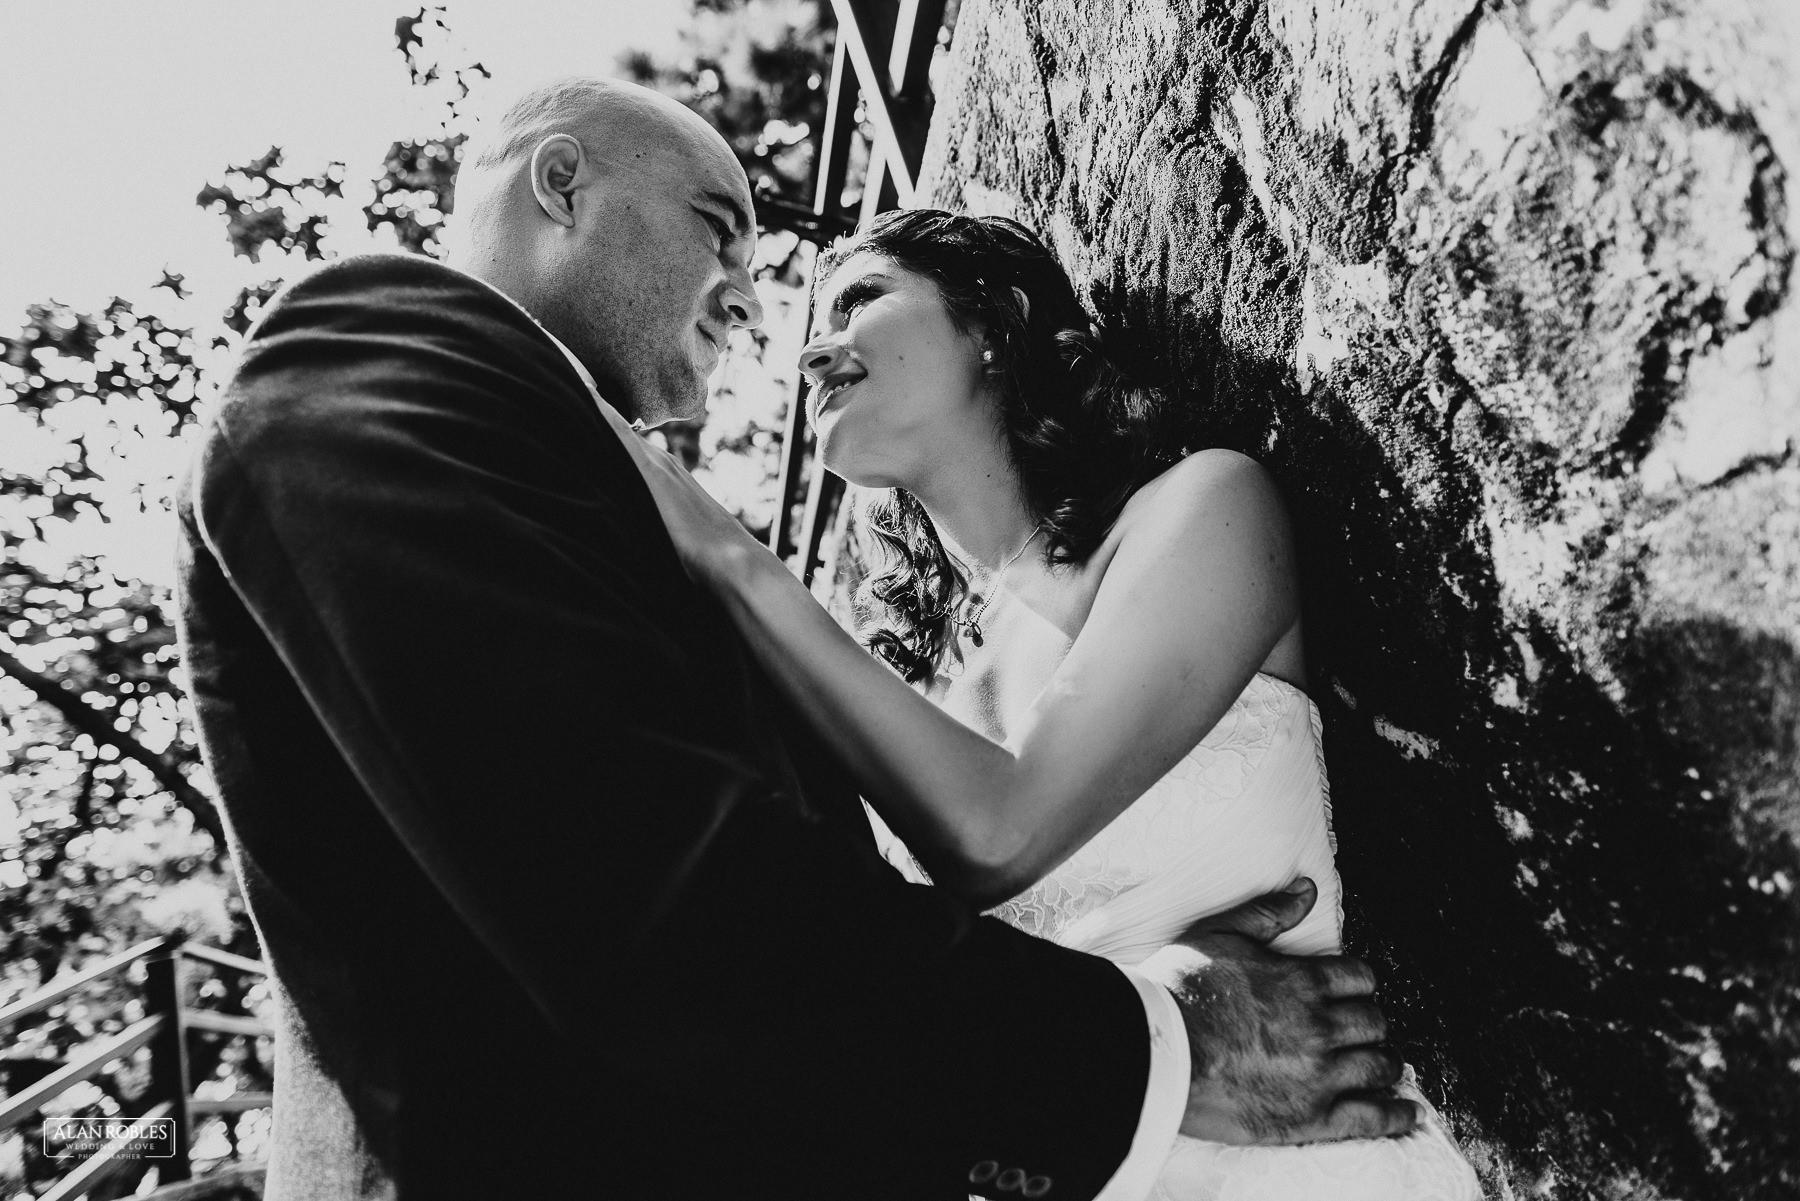 Fotografo de bodas guadalajara Alan Robles - Pinare terraza bistro 12